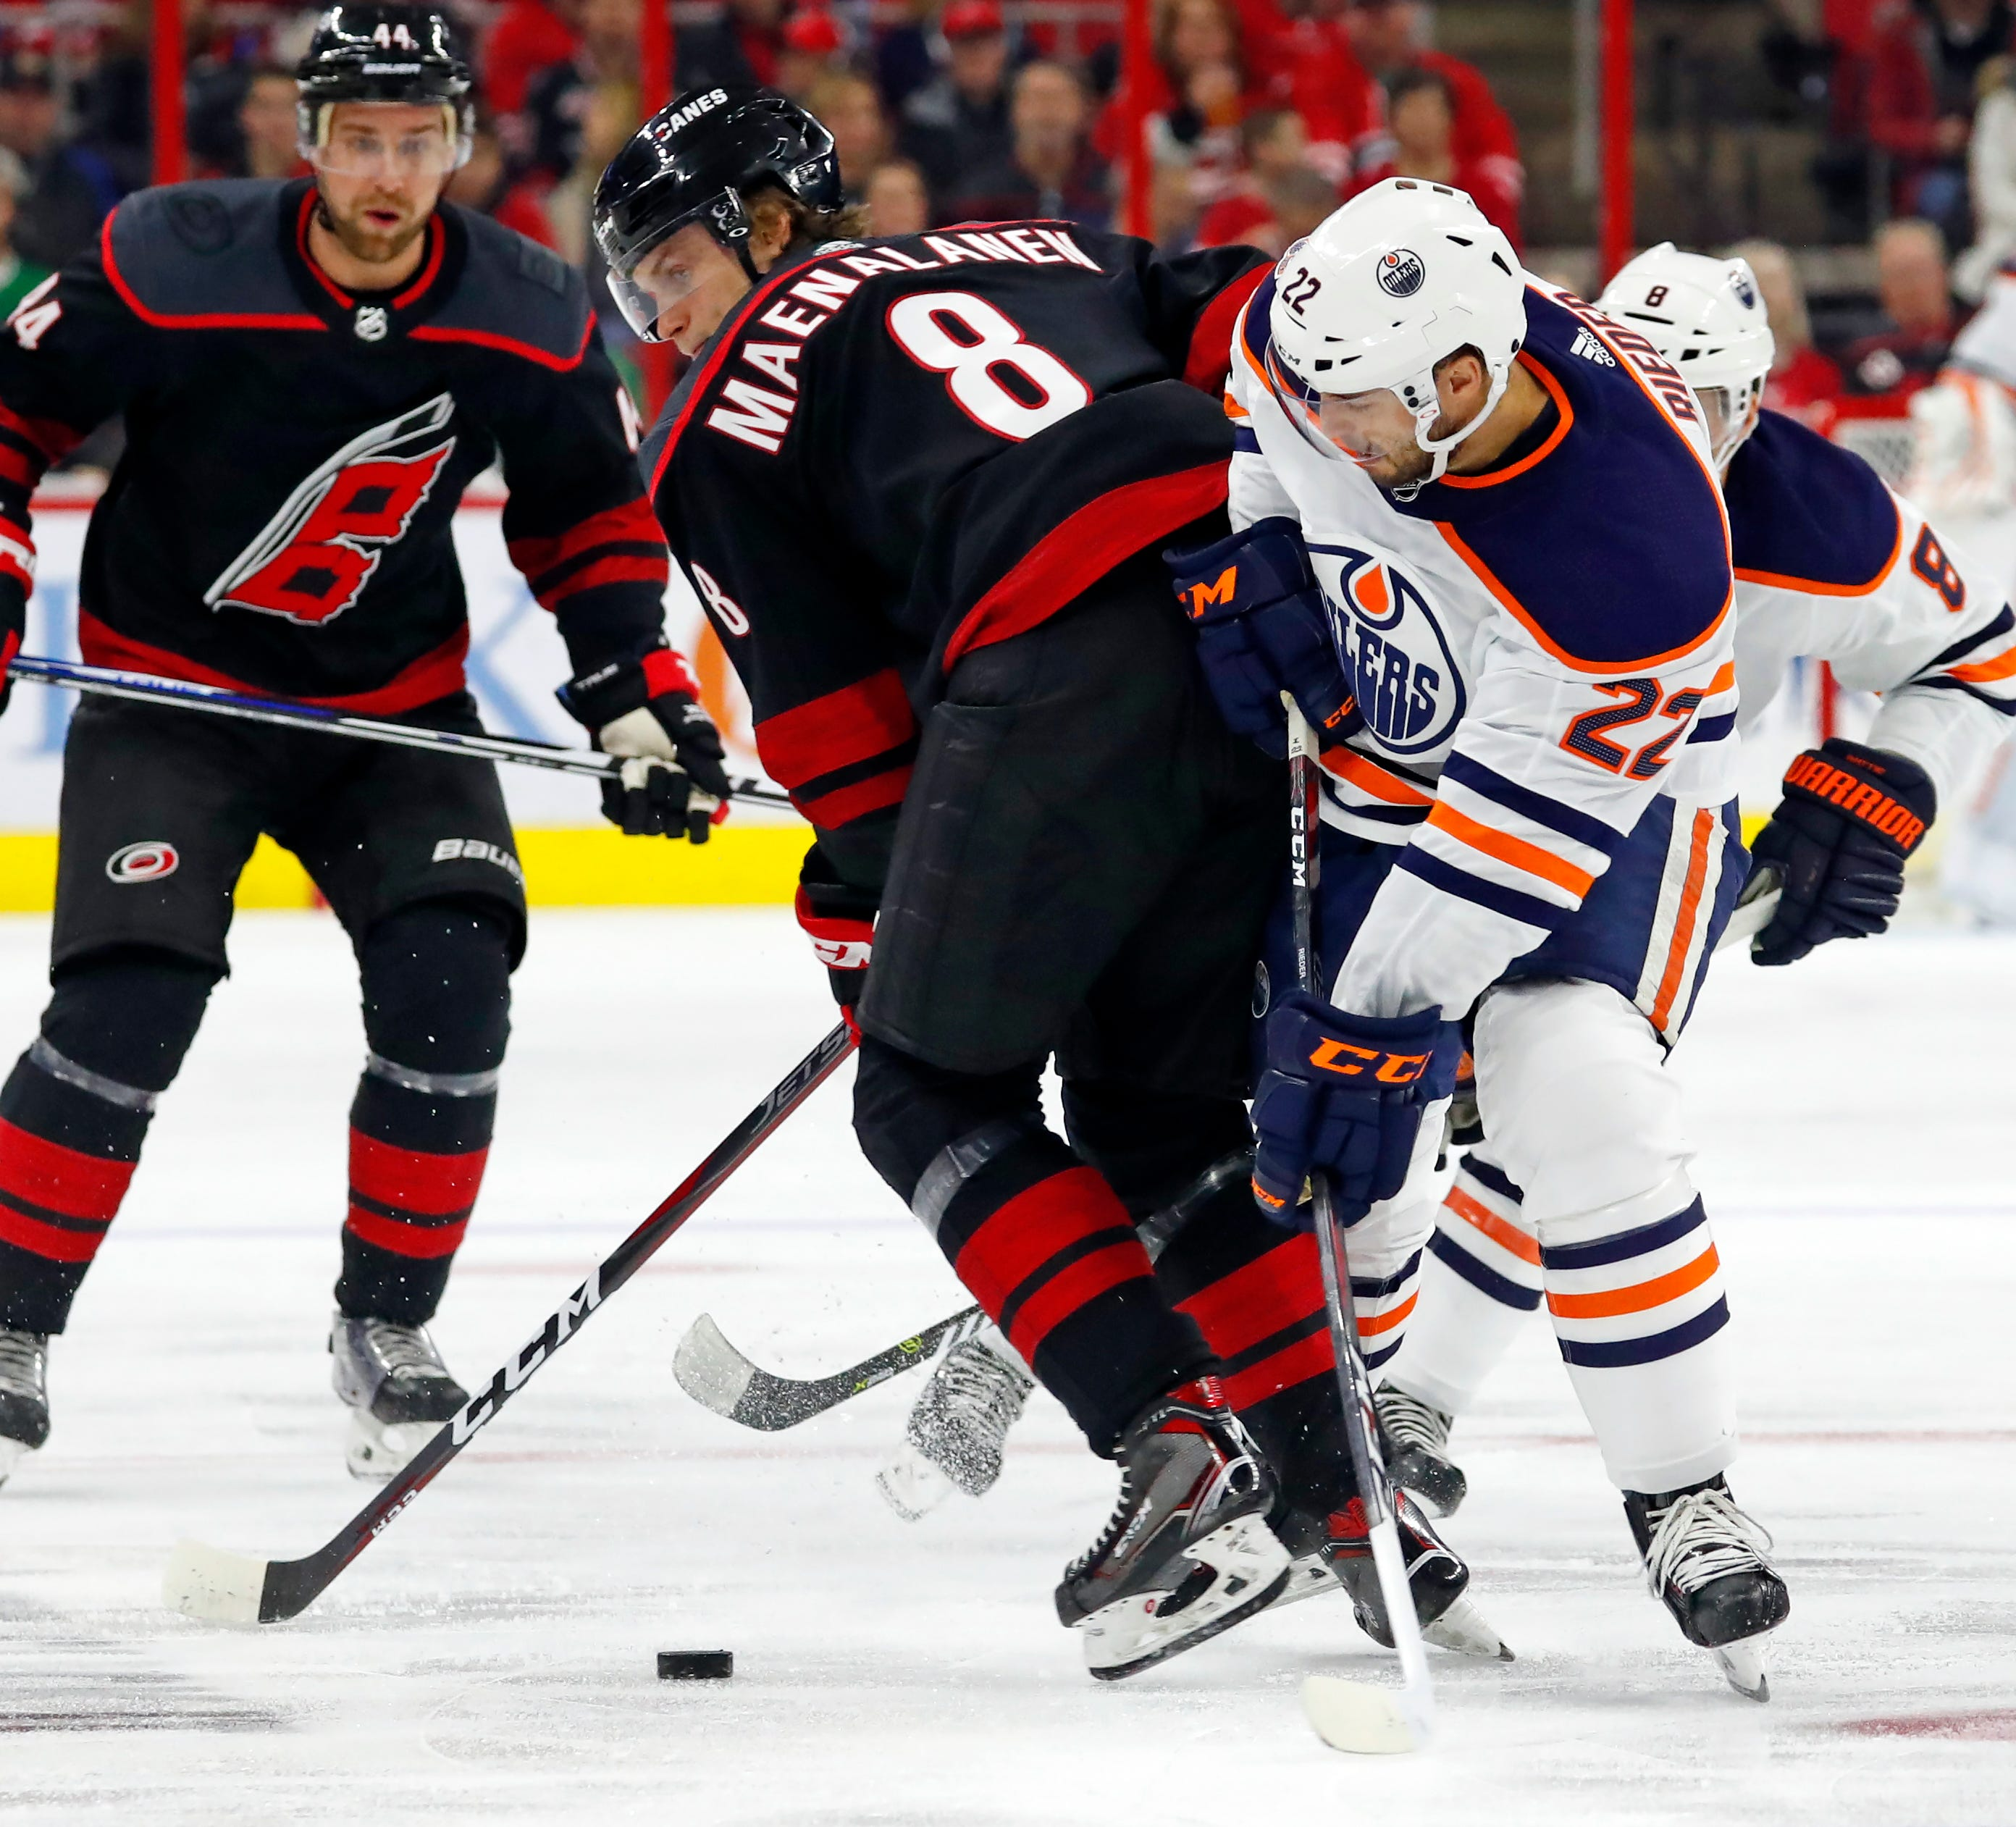 Niederreiter scores twice as Hurricanes beat Oilers 3-1